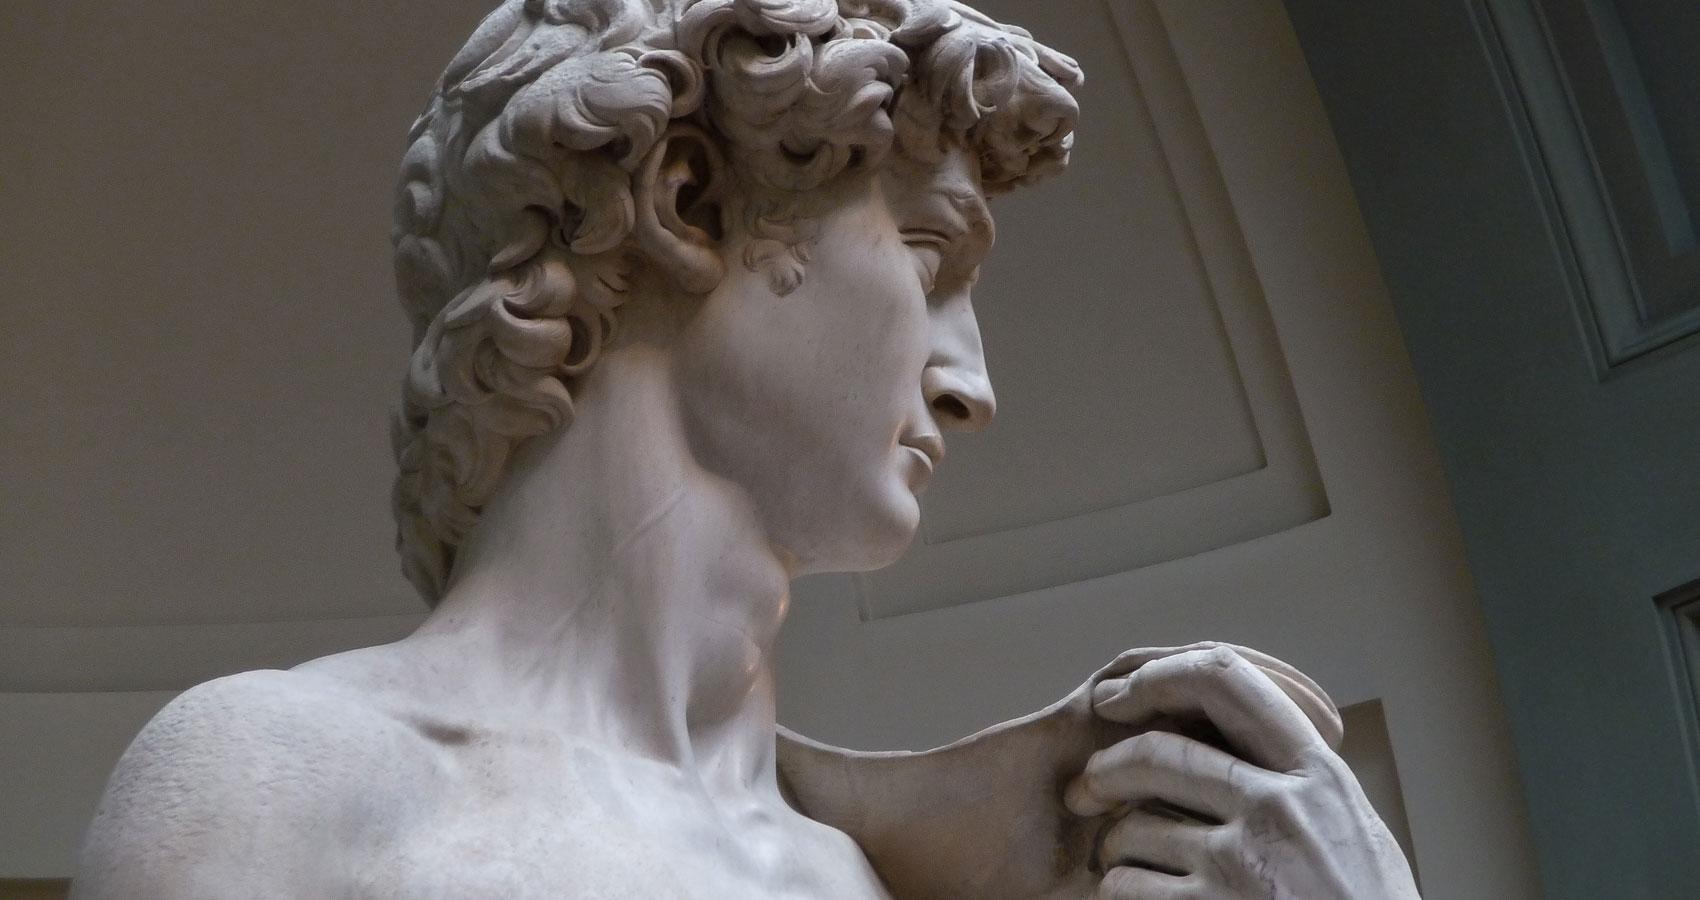 Sonetto I by Michelangelo Buonarrotiat Spillwords.com